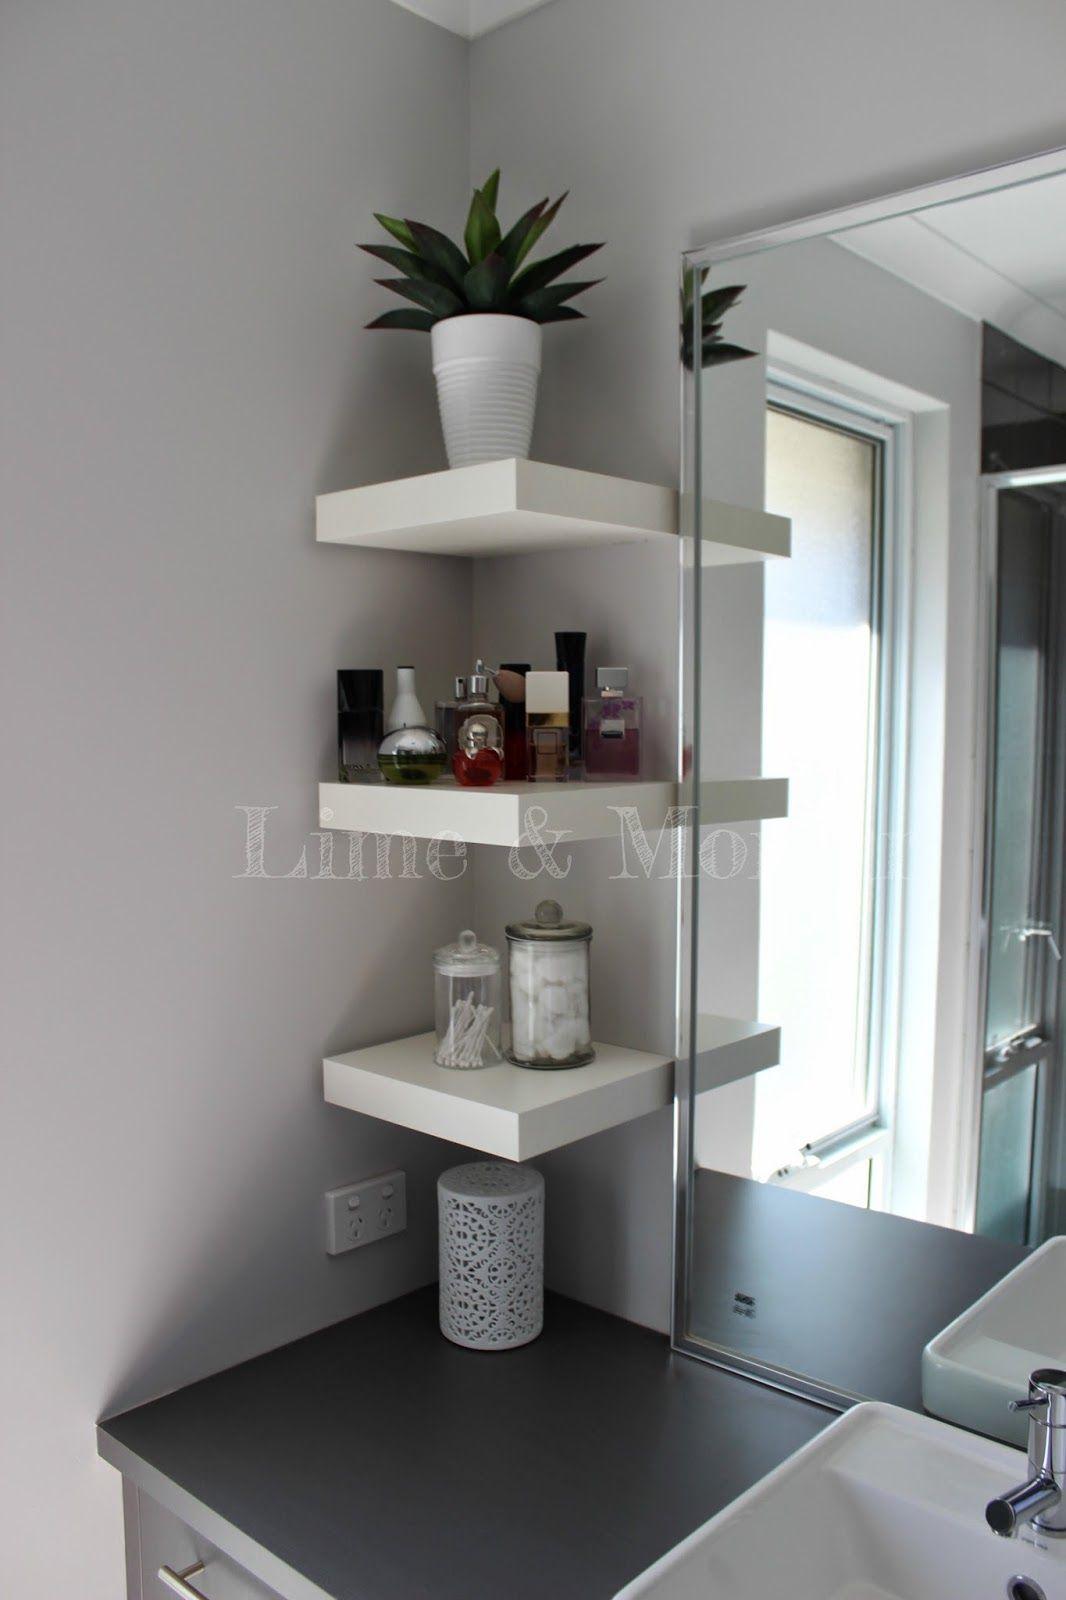 Ensuite Powder Room Ikea Lack Shelves Small Bathroom Storage Diy Bathroom Storage